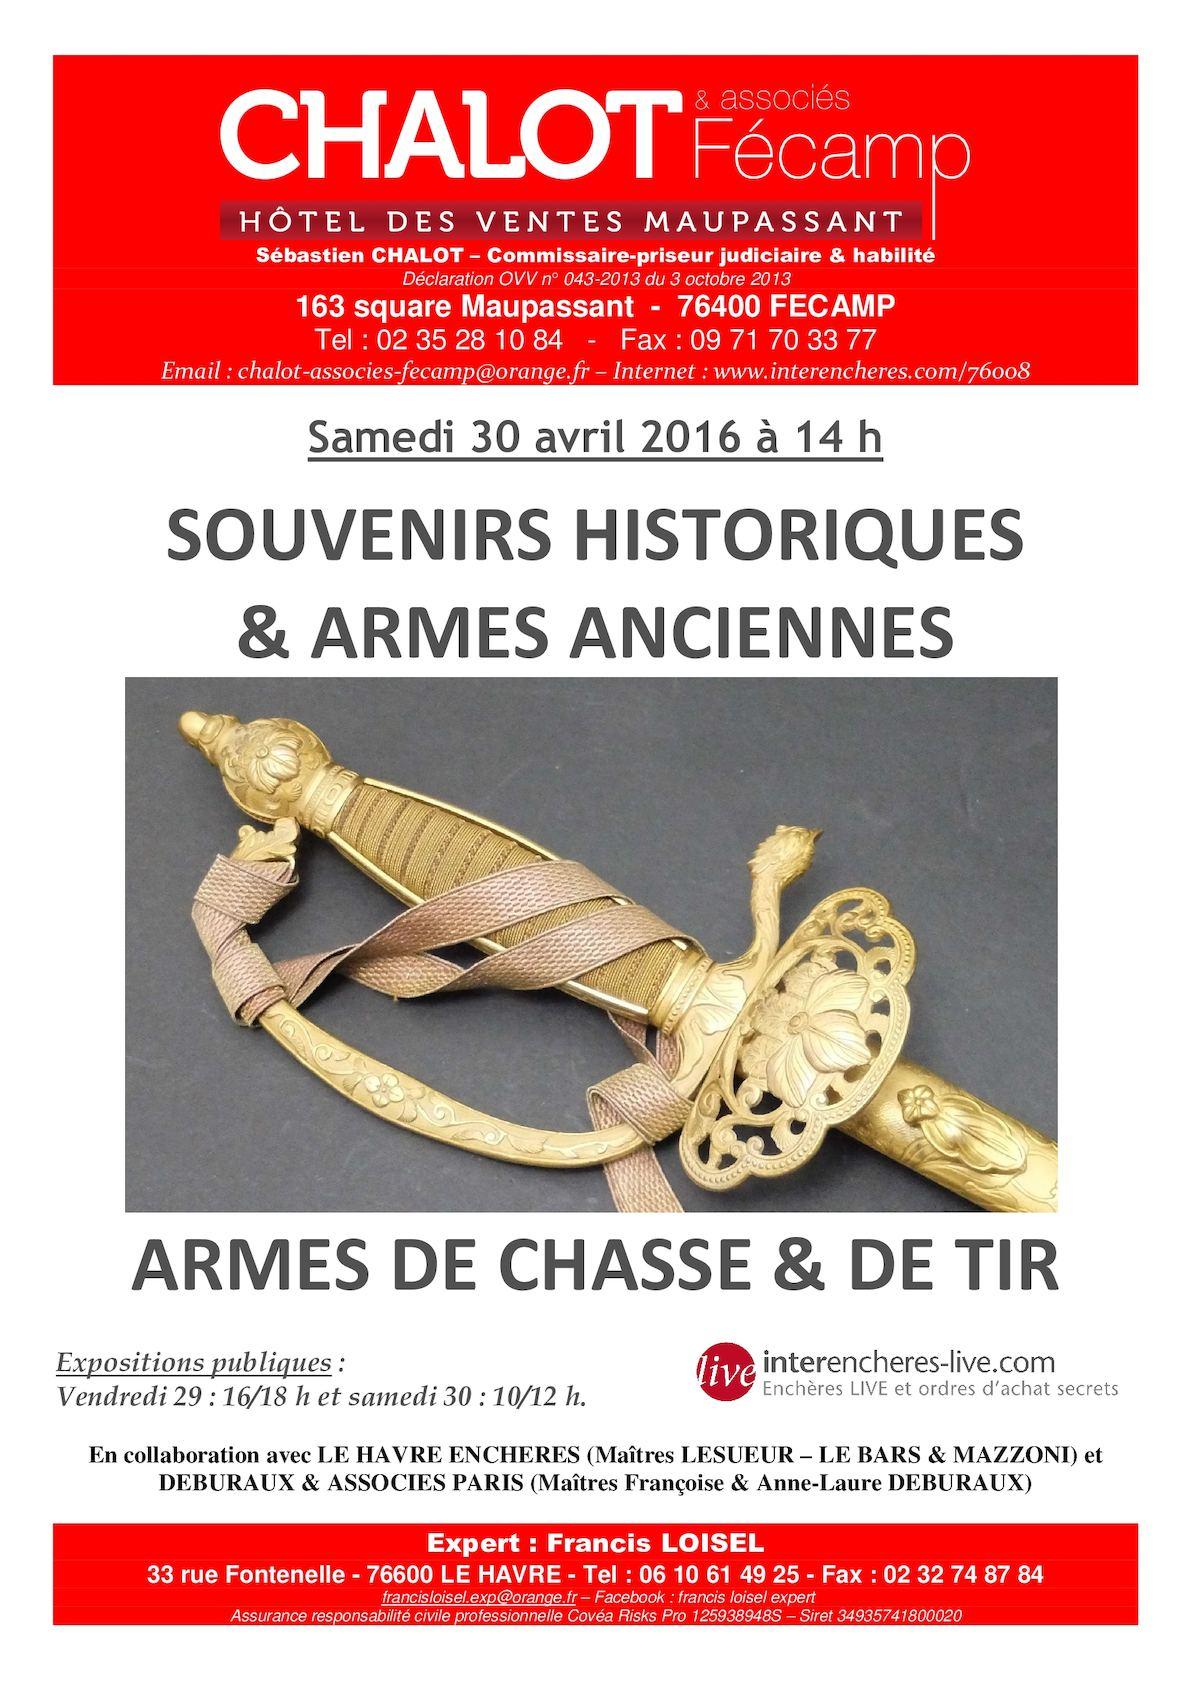 1 douzaine Bead Head Rose Wooly bougre serpentins #10 BH Truite Pêche à La Mouche Mouches NEW IN BOX